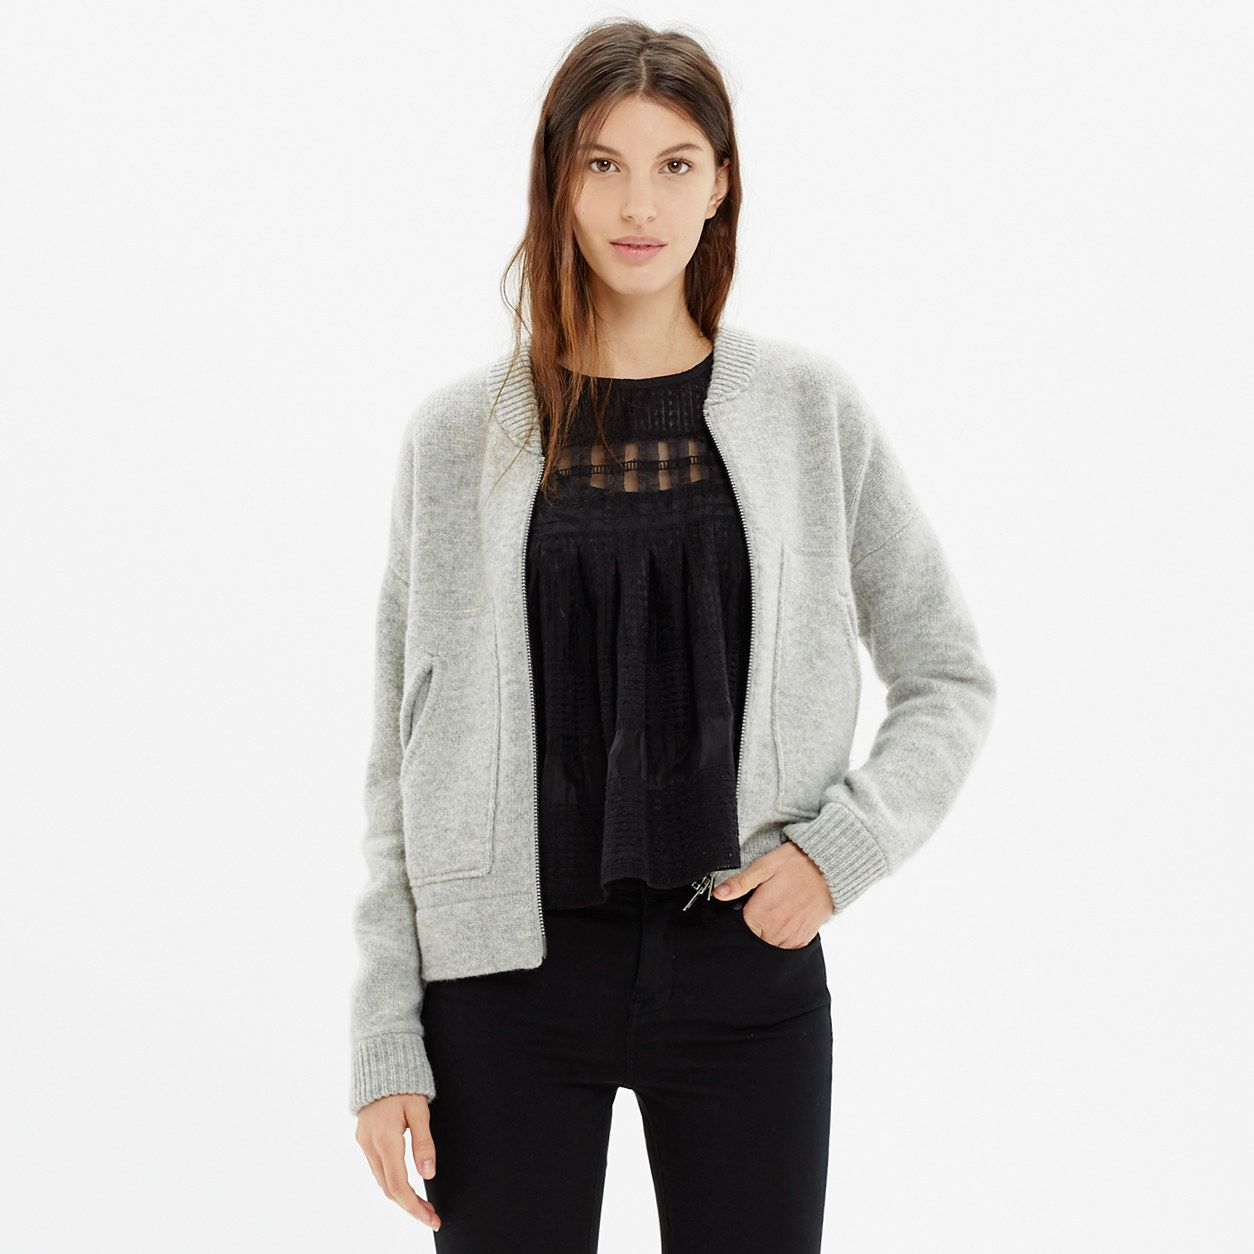 Bomber Cardigan Cardigan, Madewell sweater, Madewell jacket